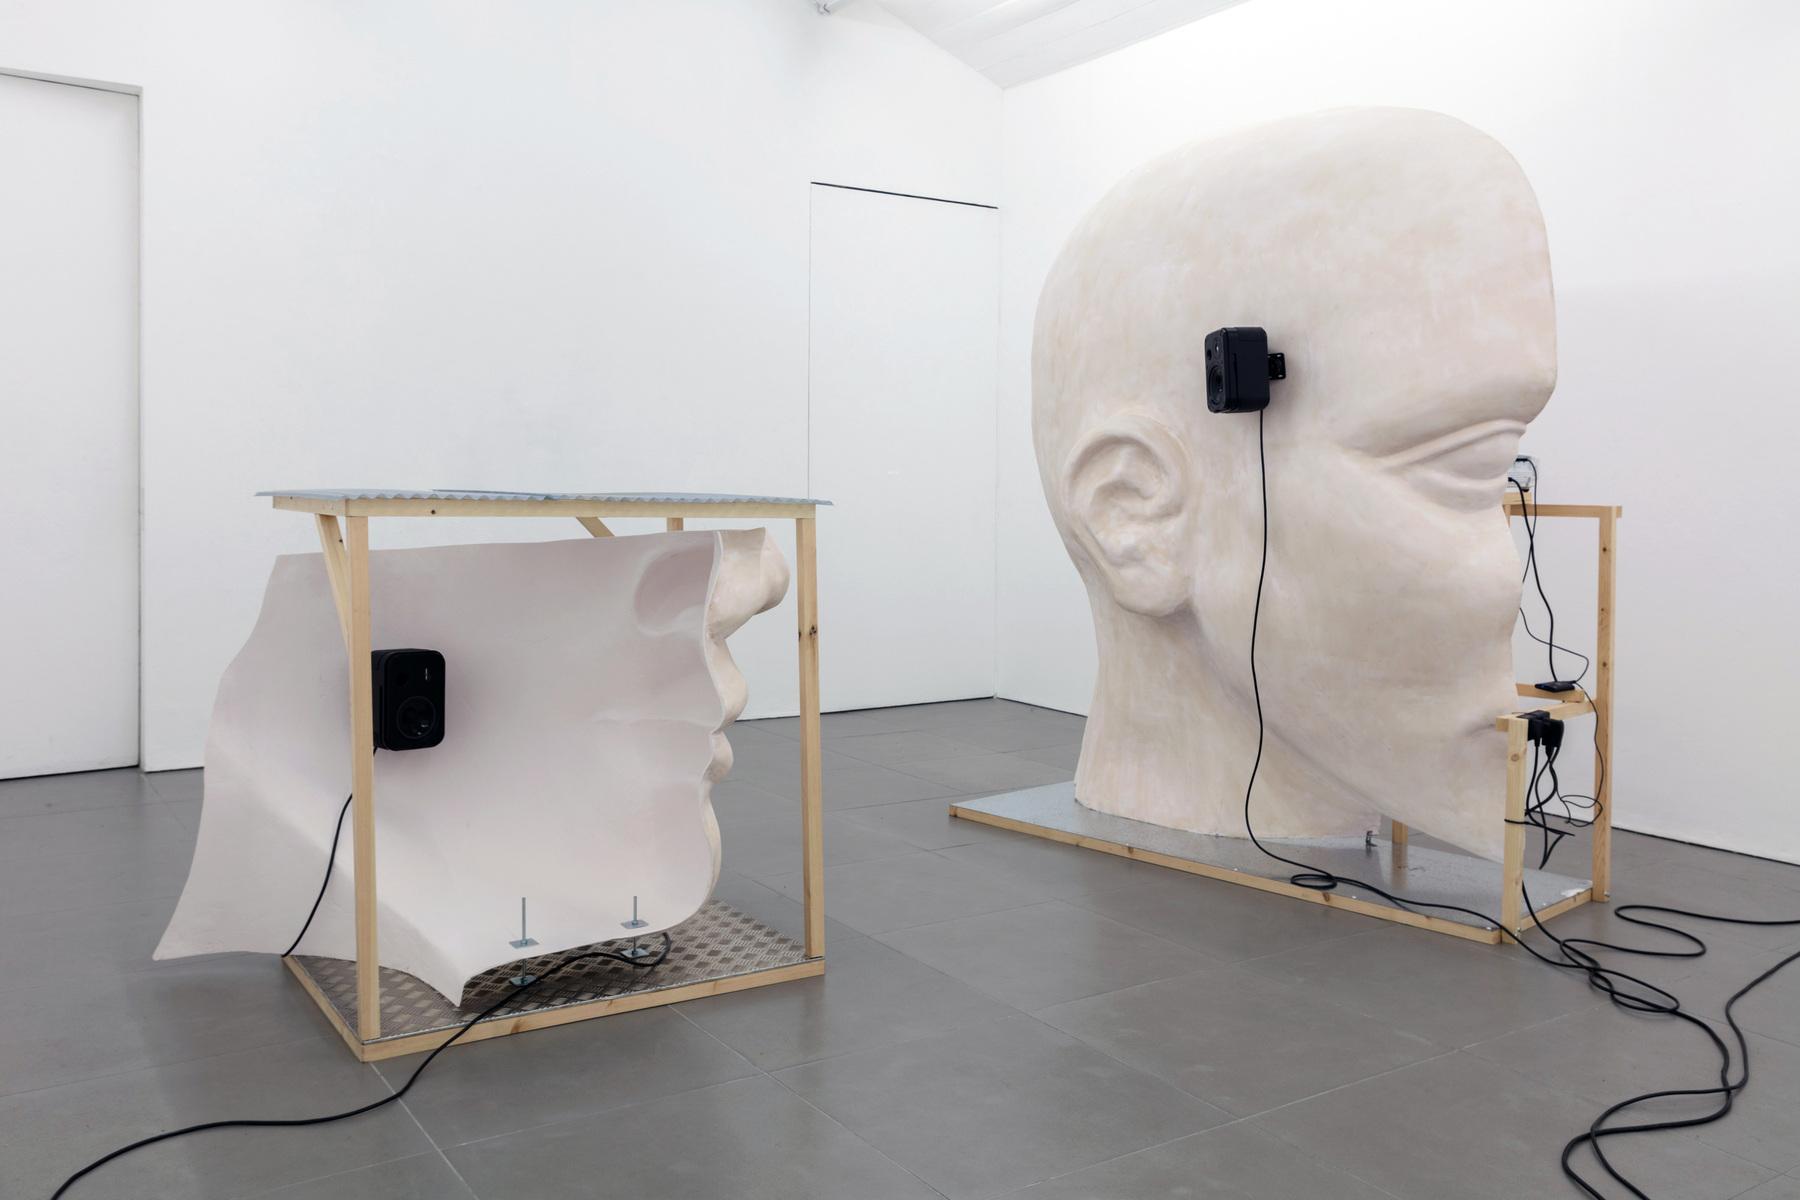 12. Anne de Vries, SUBMISSION 2015, wood, metal, fibreglass resin, audio, video